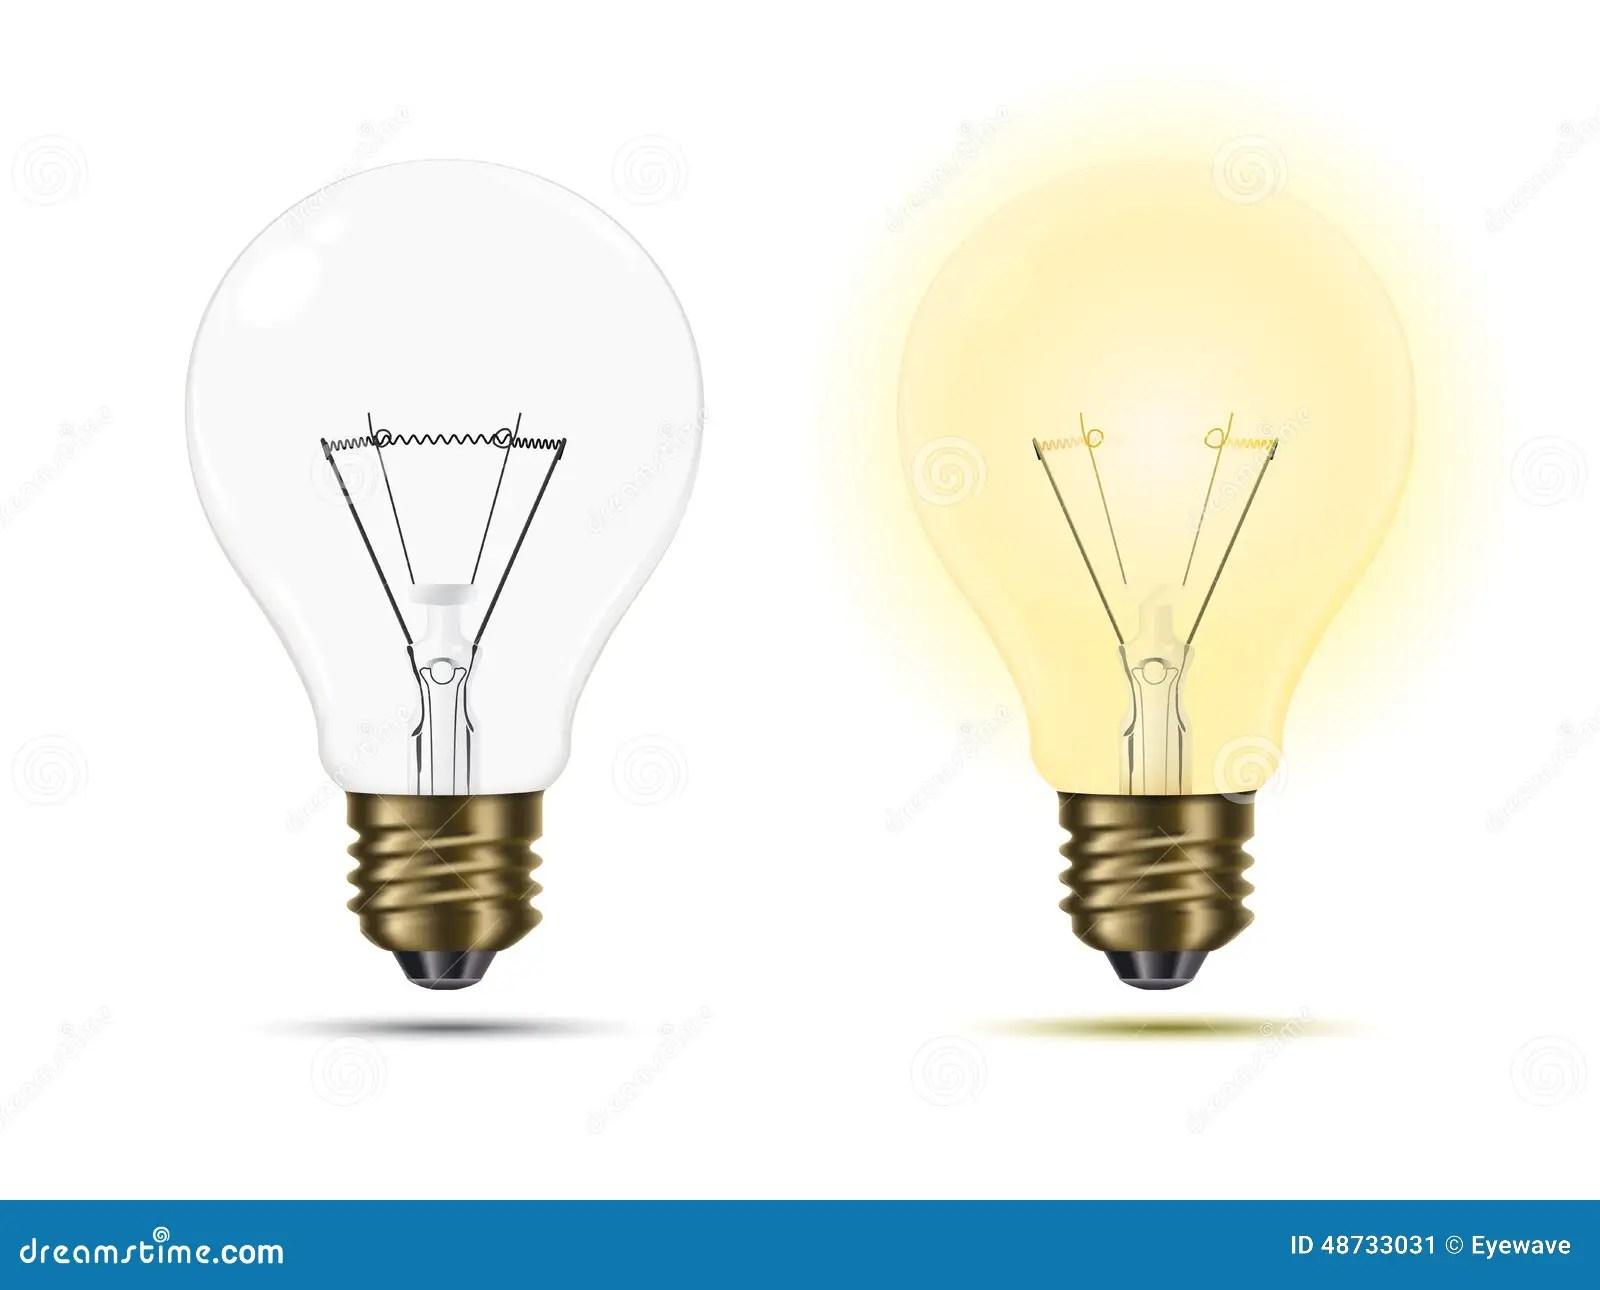 Unlimited Light Bulbs